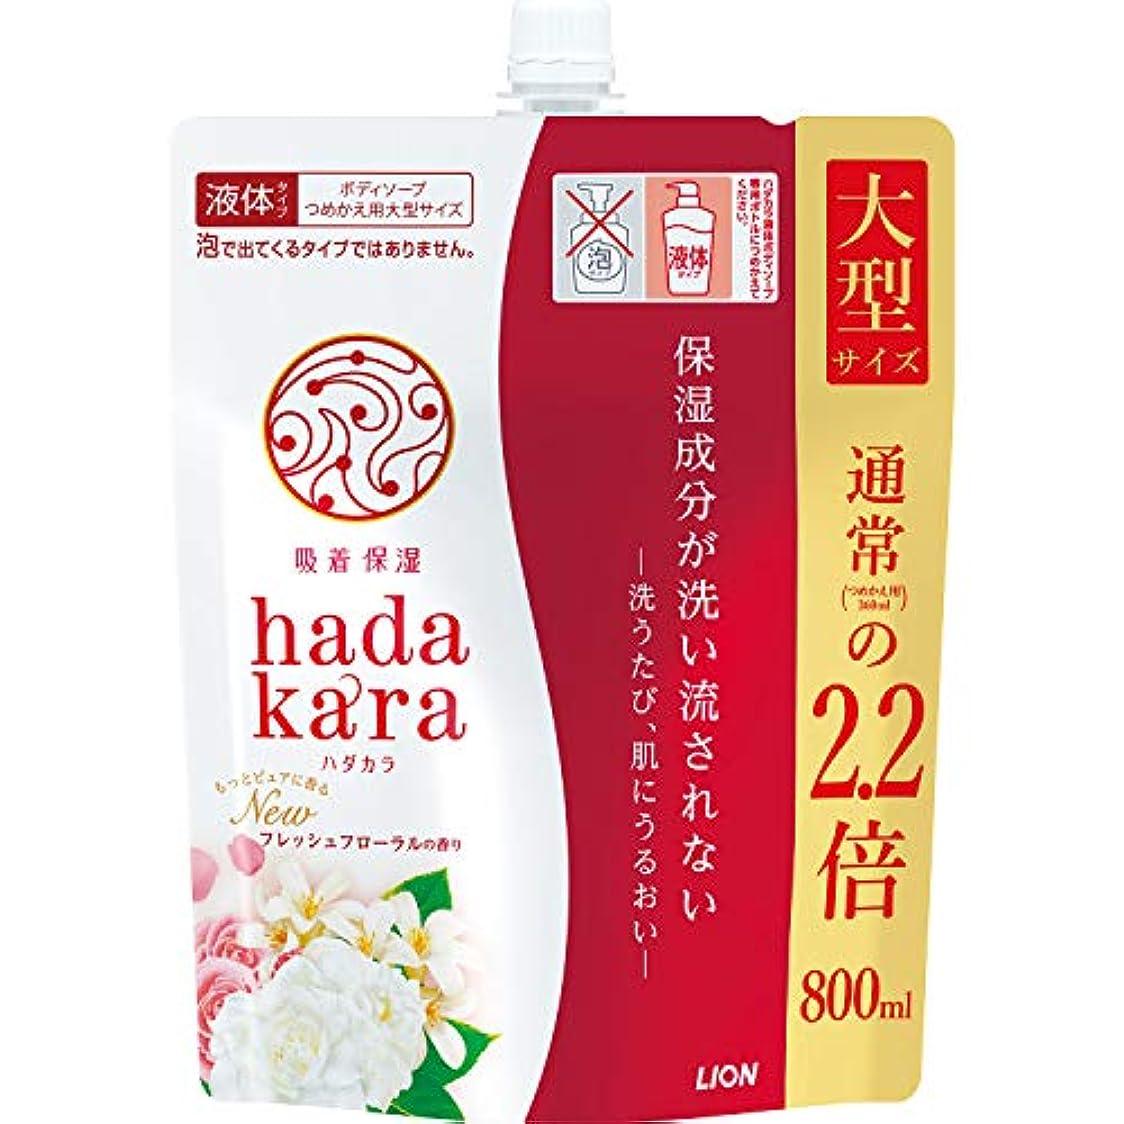 hadakara(ハダカラ) ボディソープ フレッシュフローラルの香り つめかえ用大型サイズ 800ml